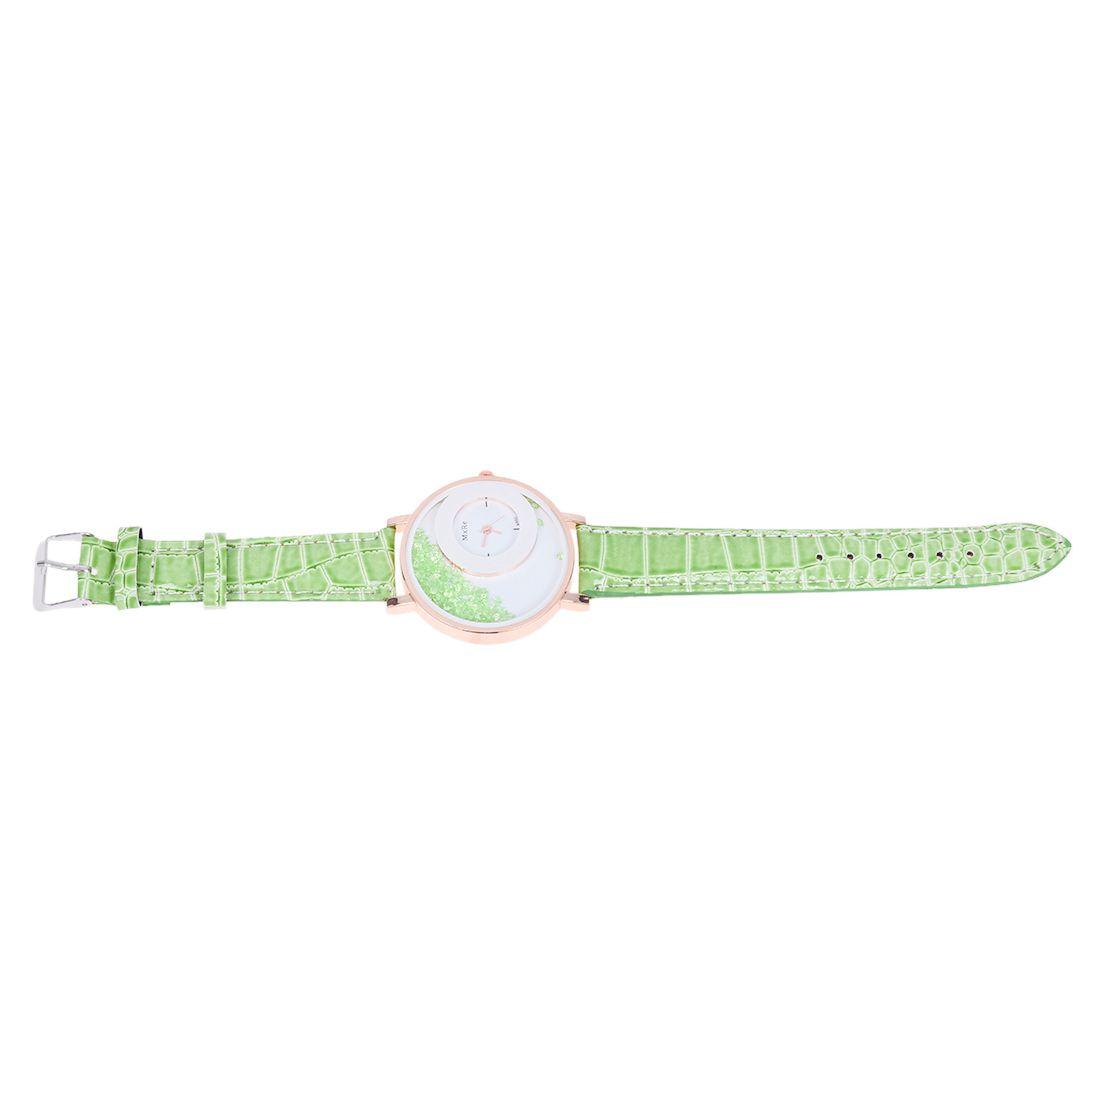 5X-MXRE-Women-039-s-Rhinestones-Faux-Leather-Wrist-Watch-Green-T3U2